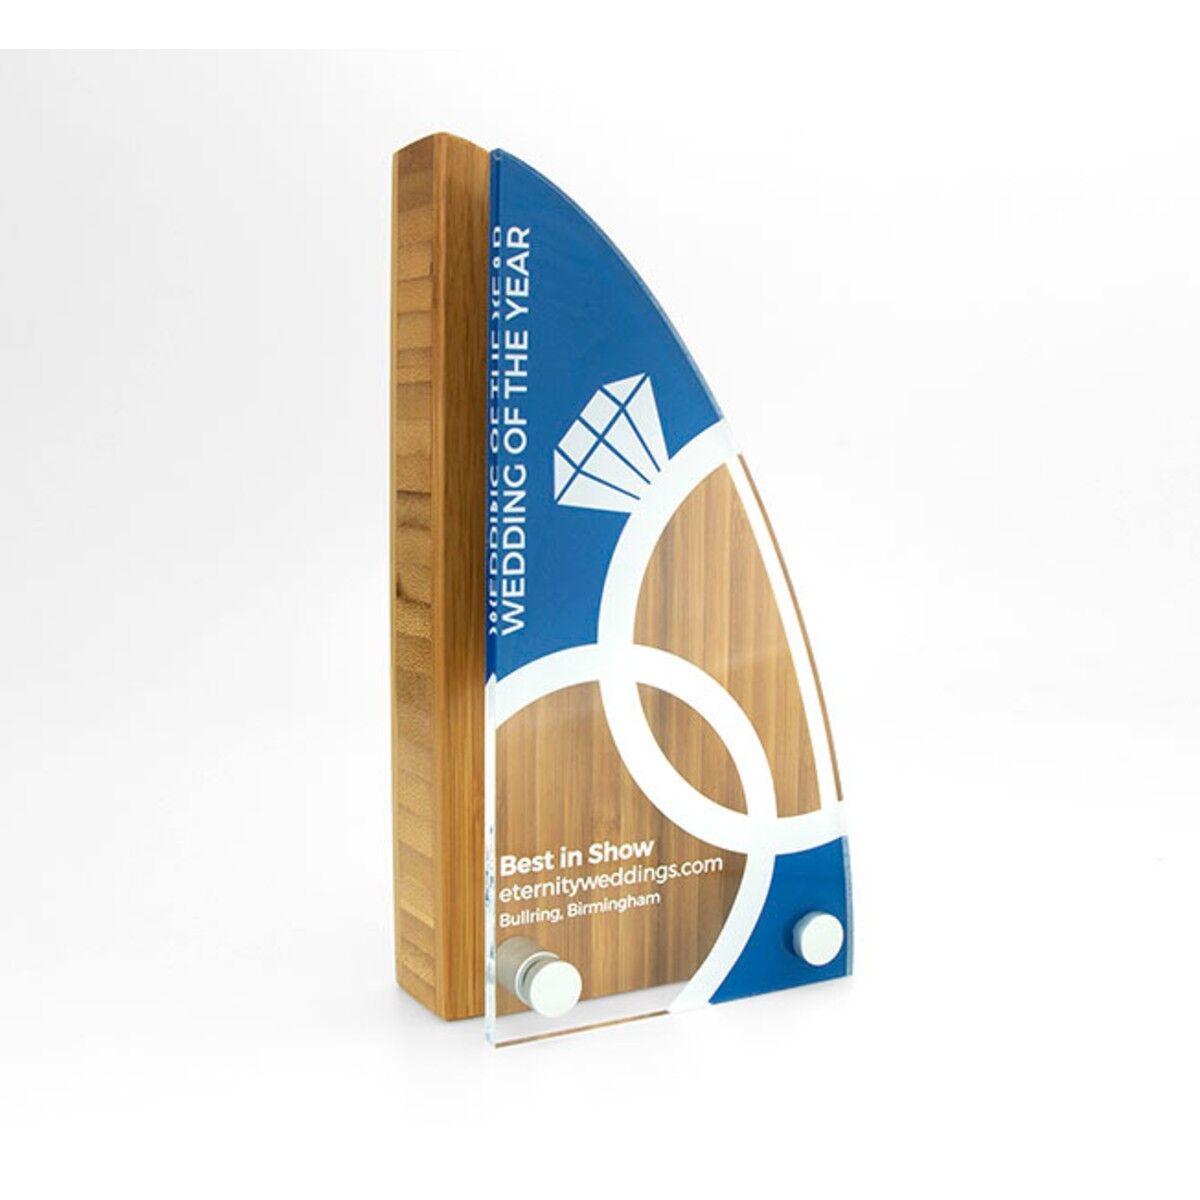 Bamboo Block Awards with acrylic front